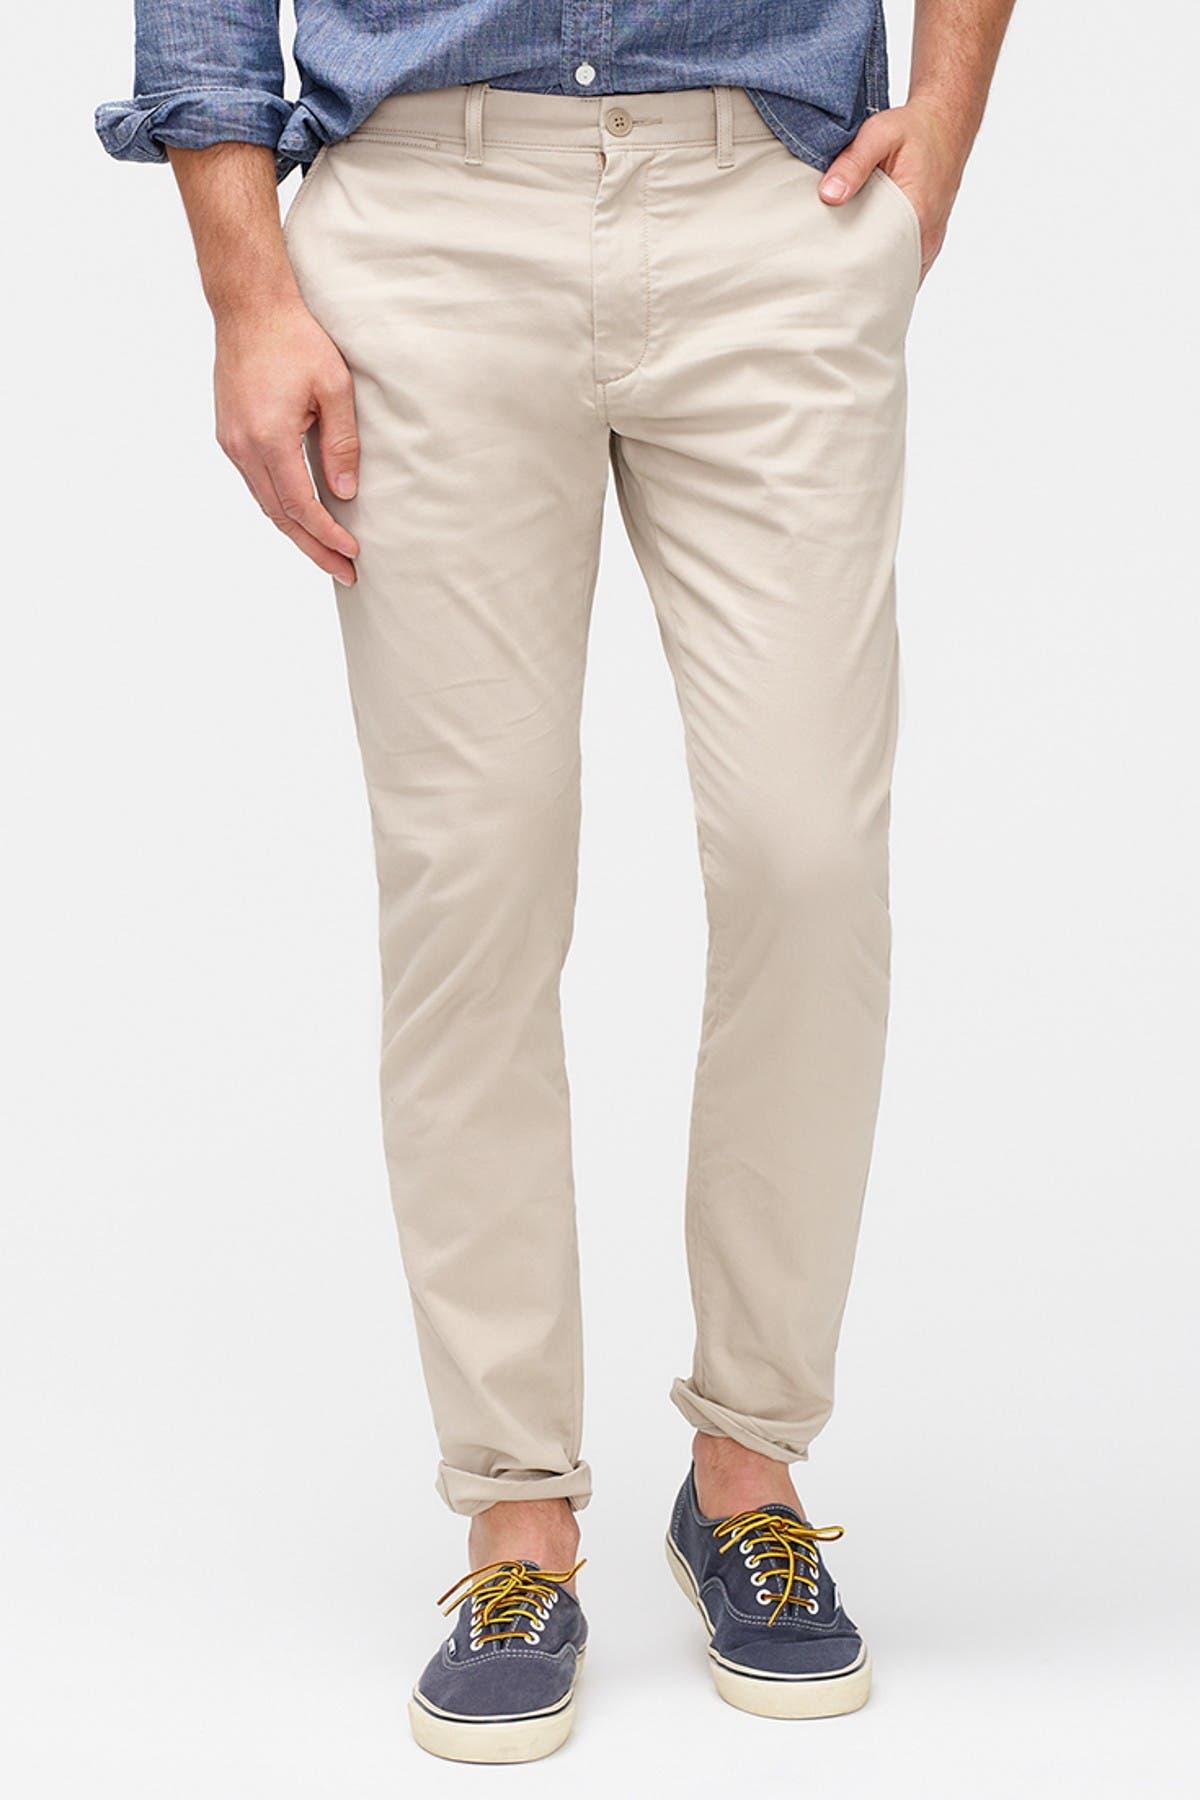 Image of J. Crew 250 Skinny Core Stretch Pants